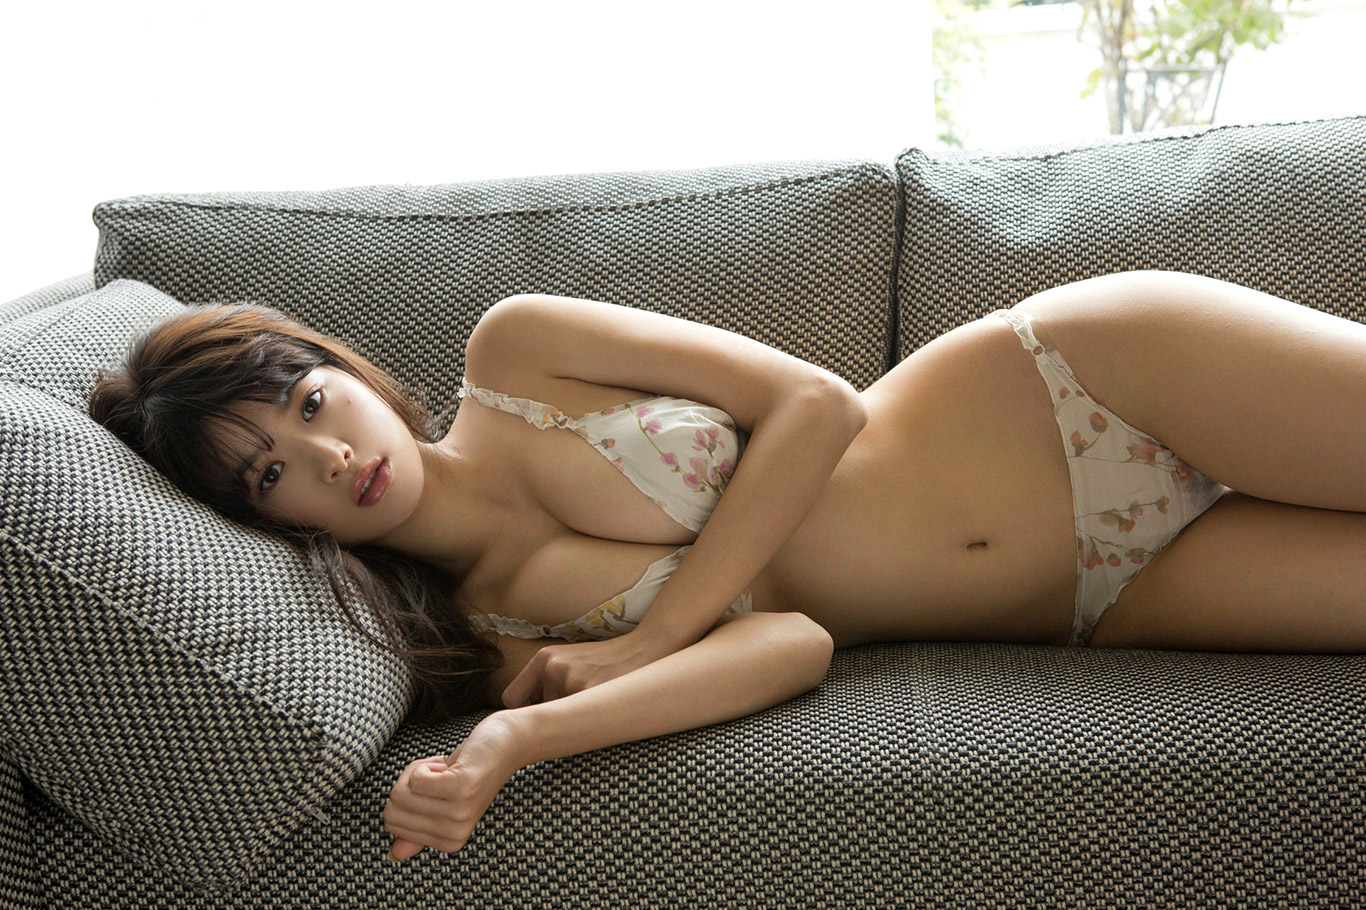 Kasumi uehara beautiful asian porntar 10